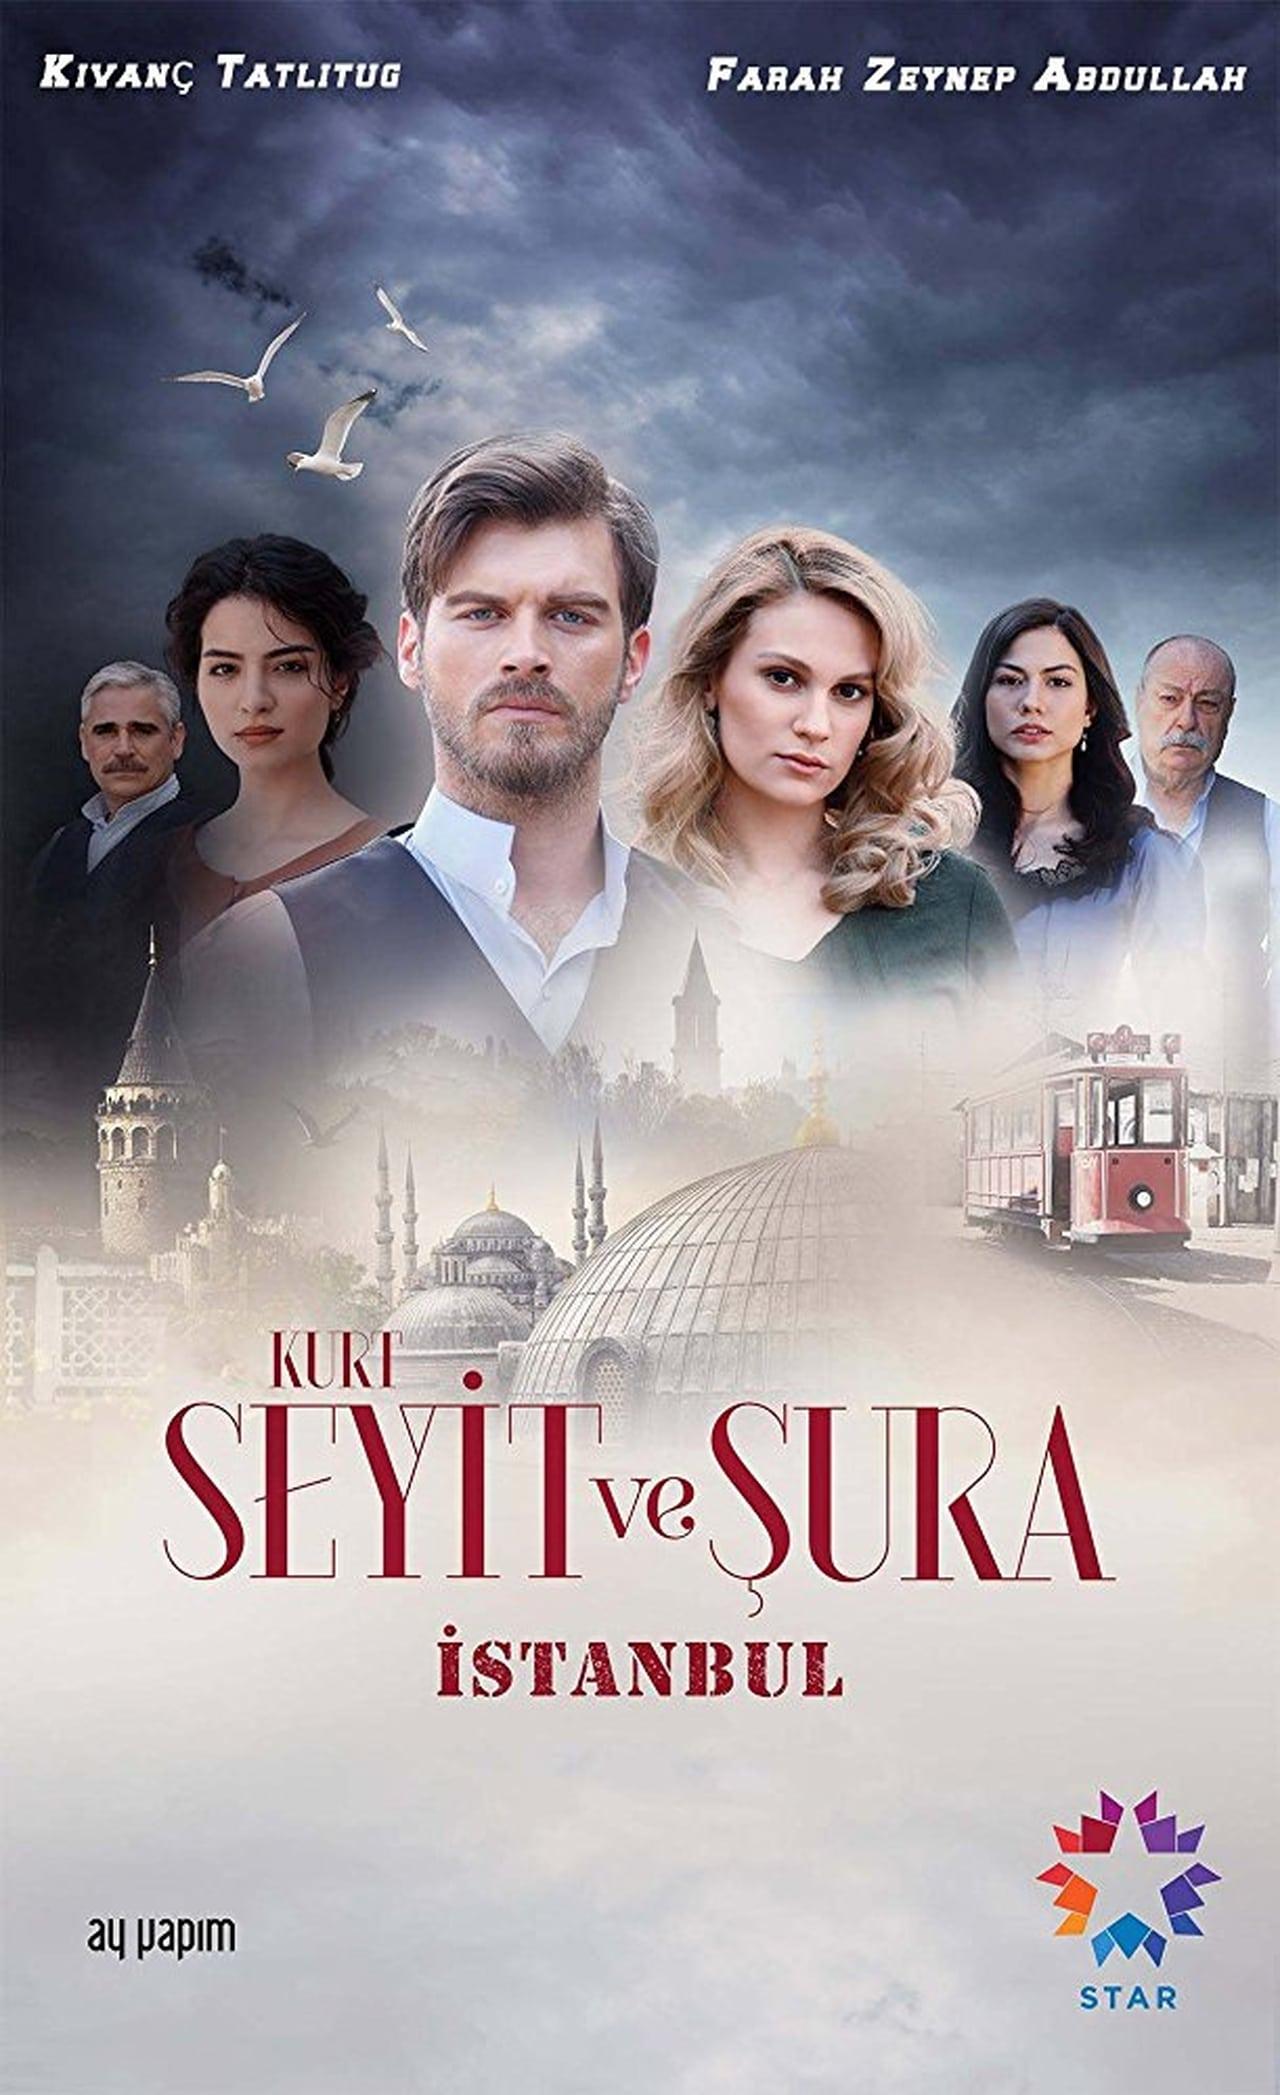 Kurt Seyit And Şura Season 1